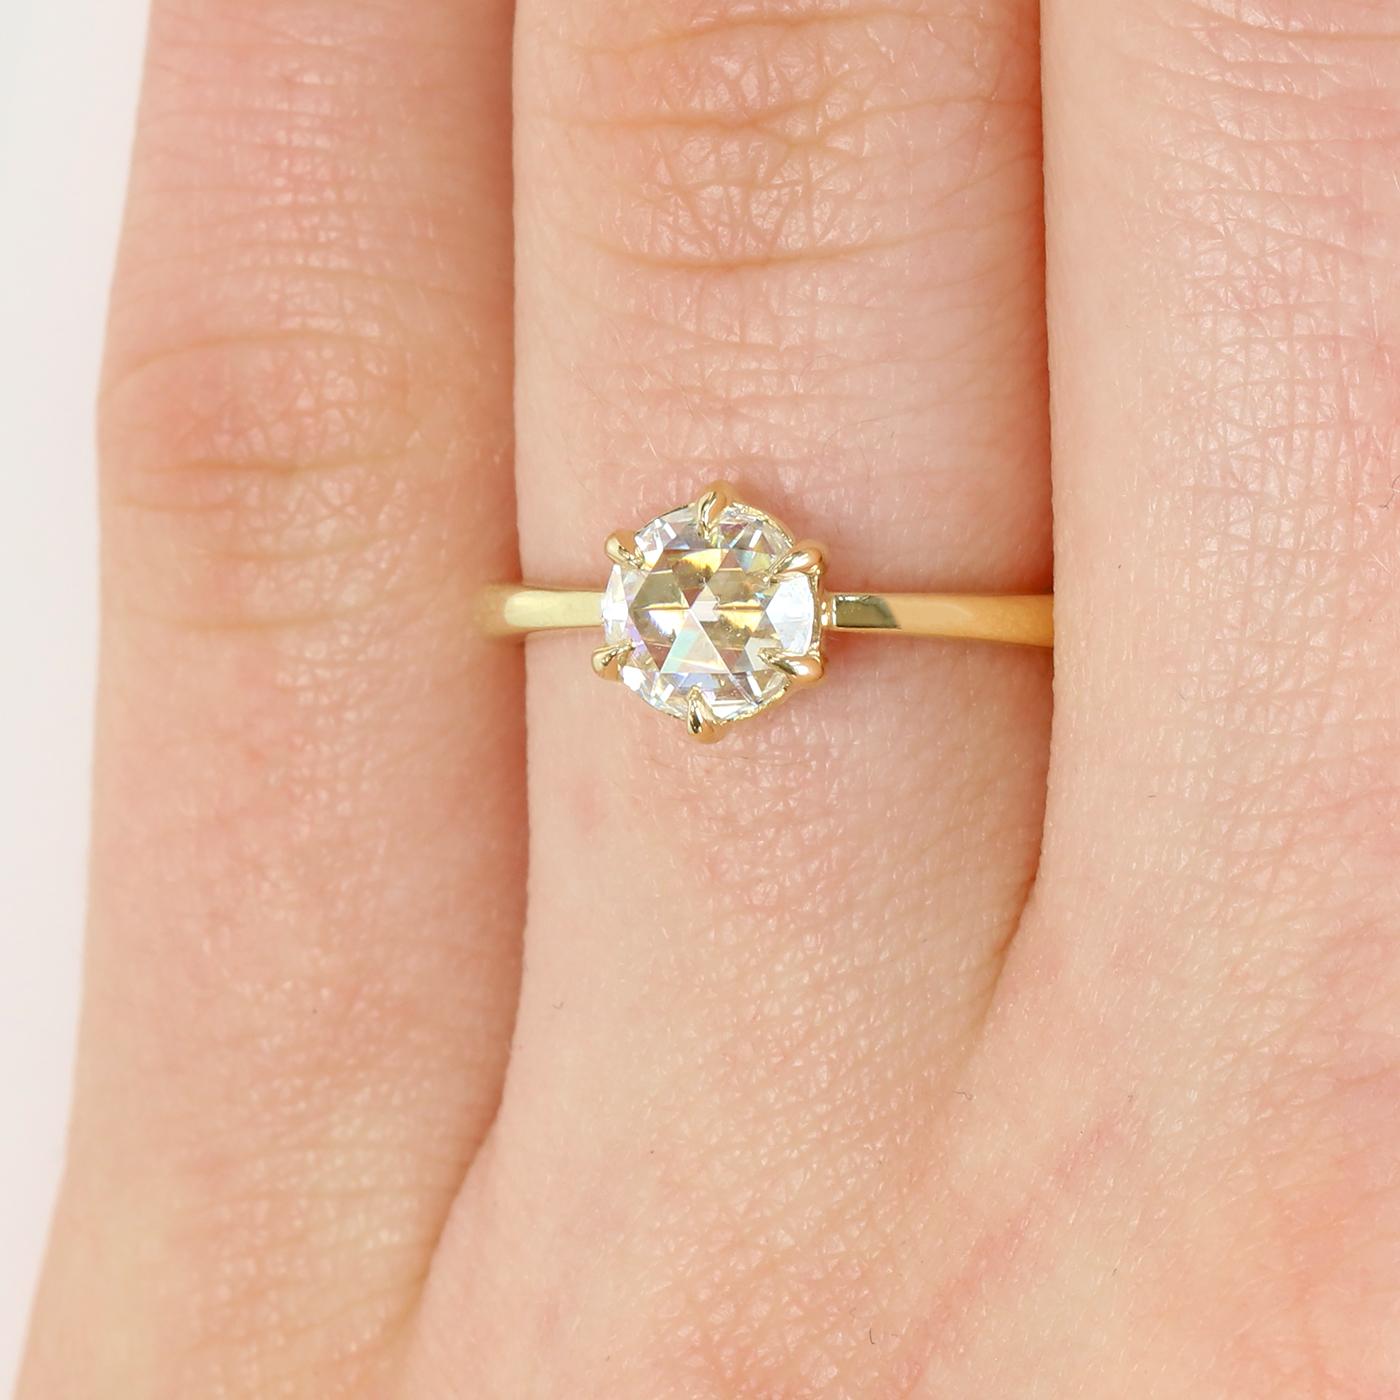 Rose Cut 6 Prong Diamond Engagement Ring 18ct Golds Or Platinum Lilia Nash